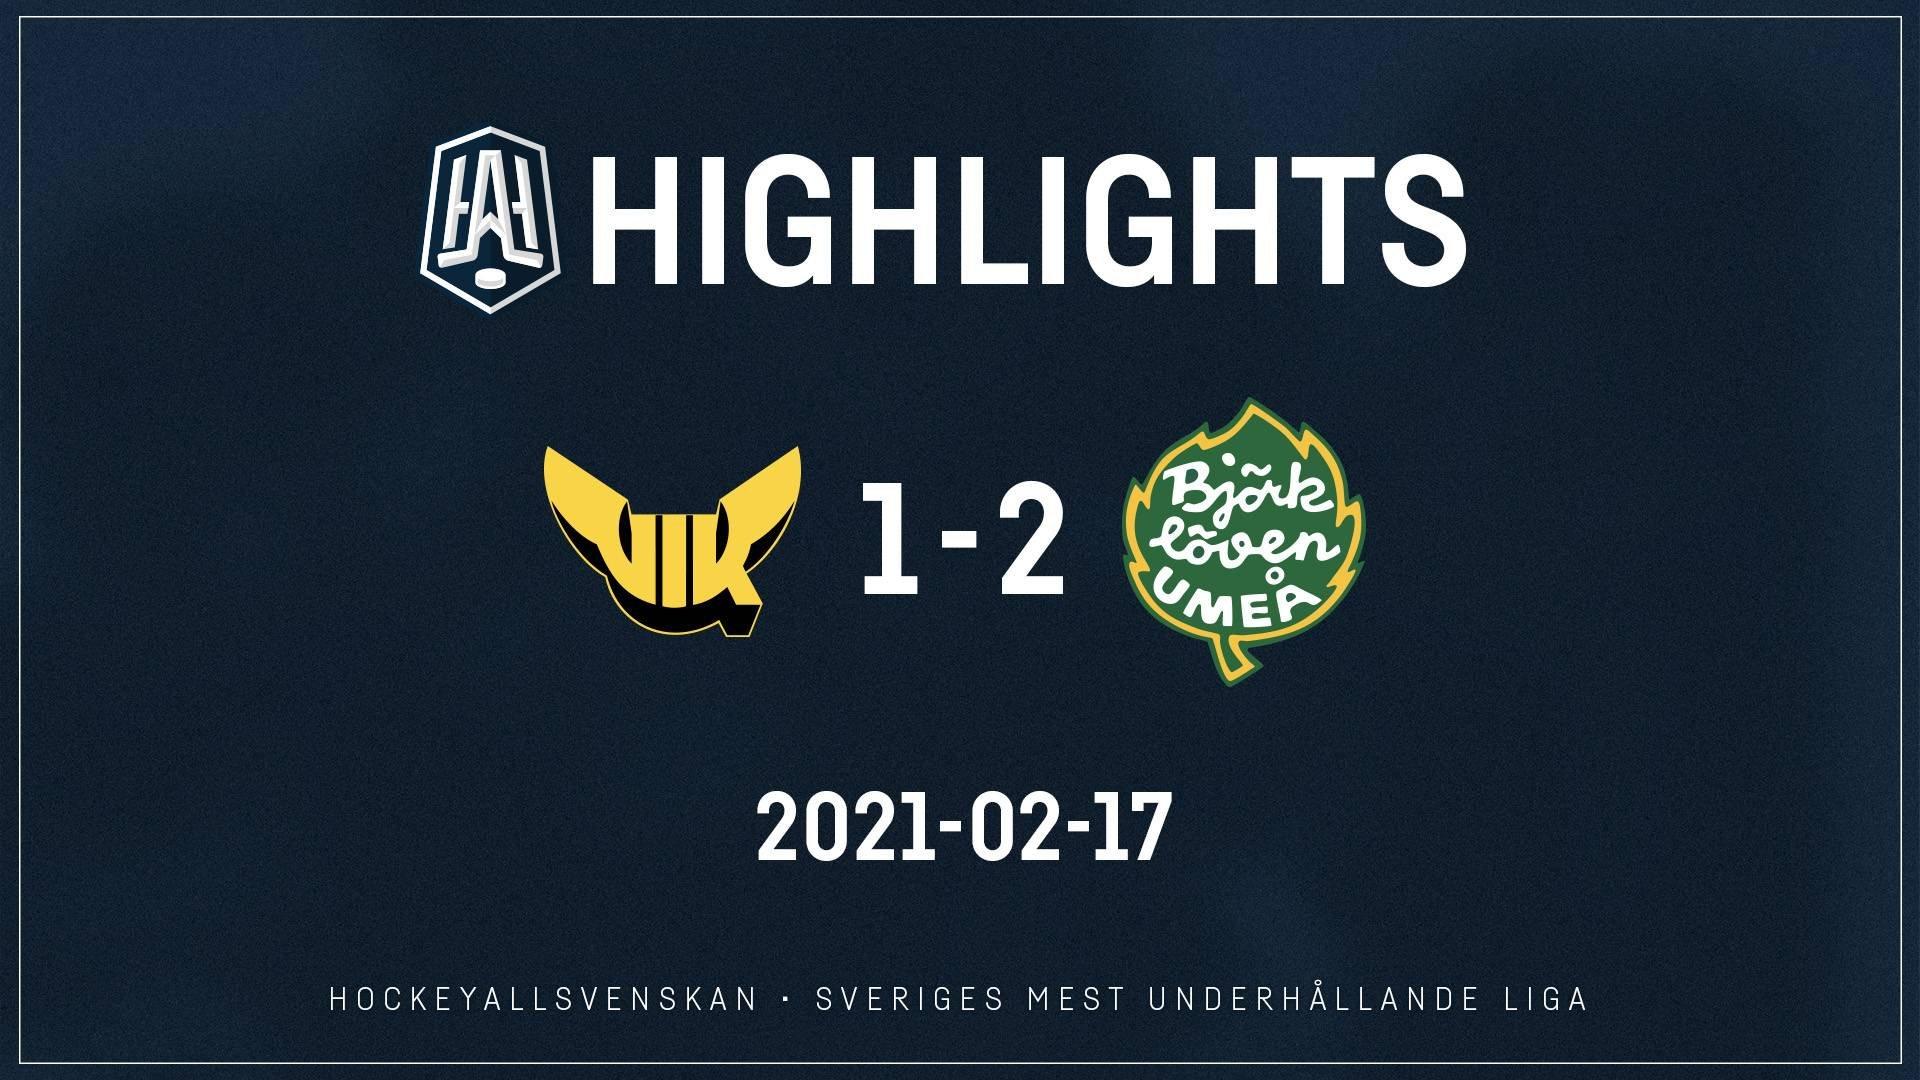 2021-02-17 Västerås - Björklöven 1-2